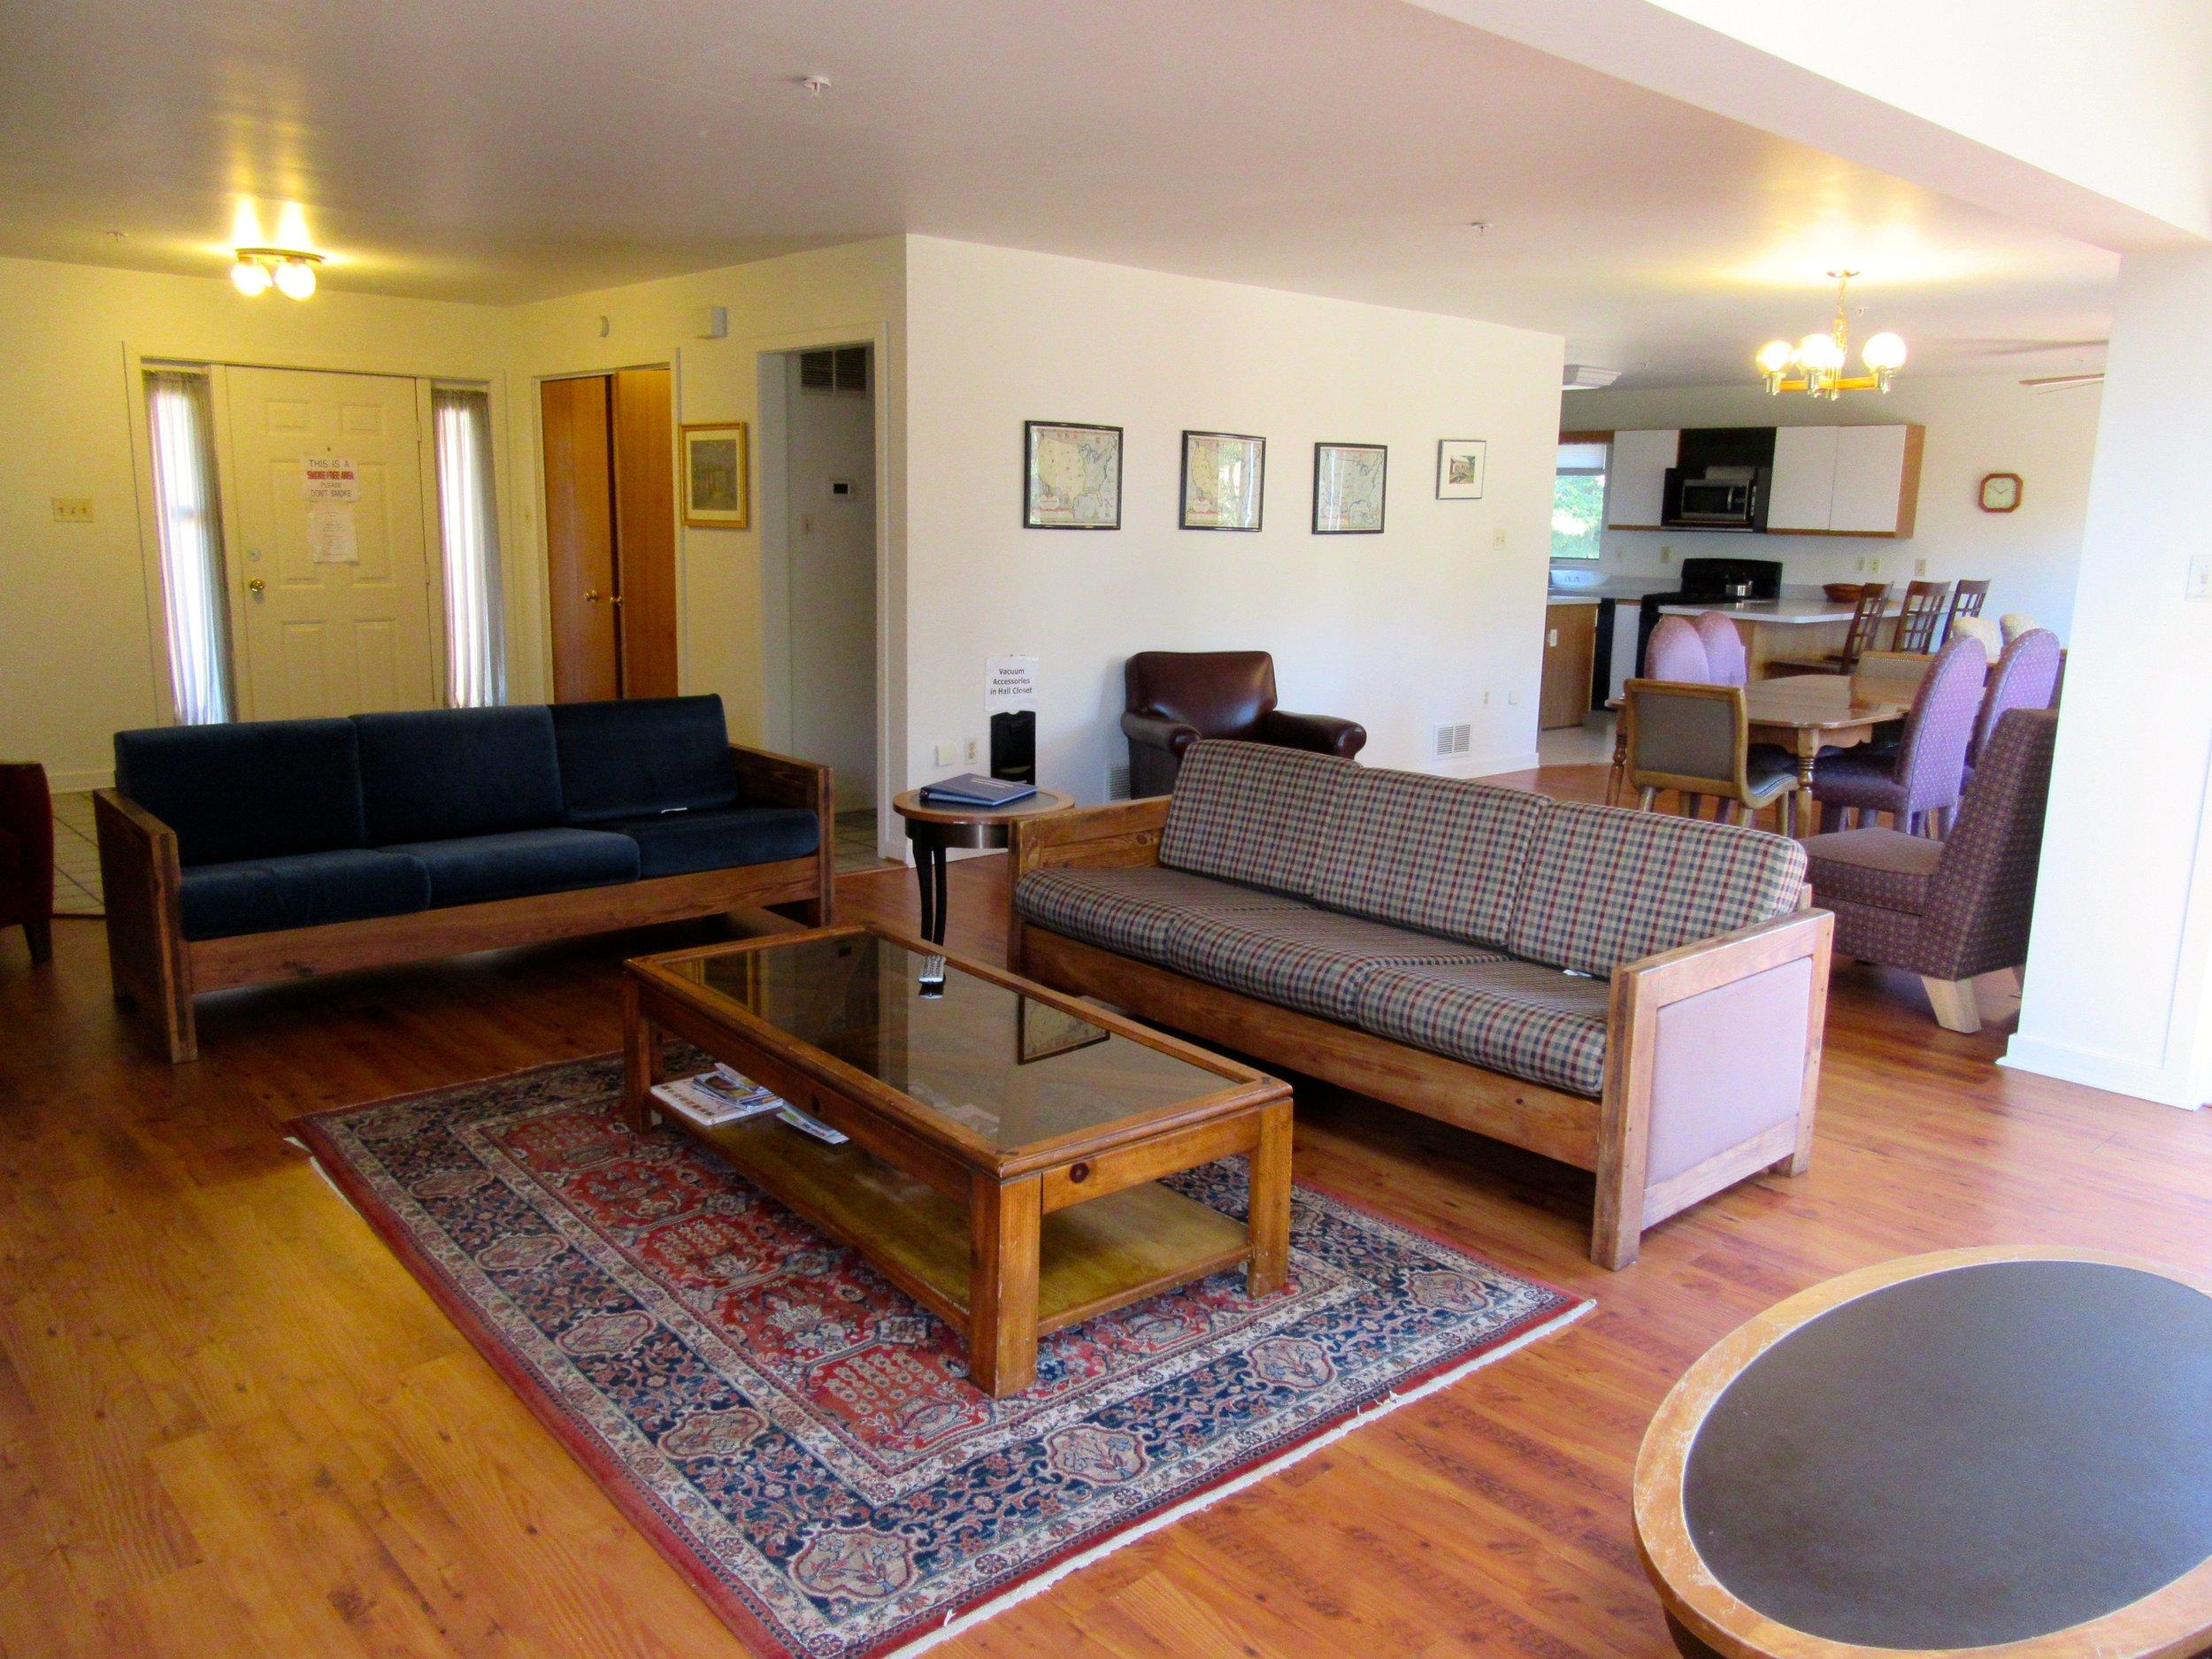 Cottage Interior Living Room